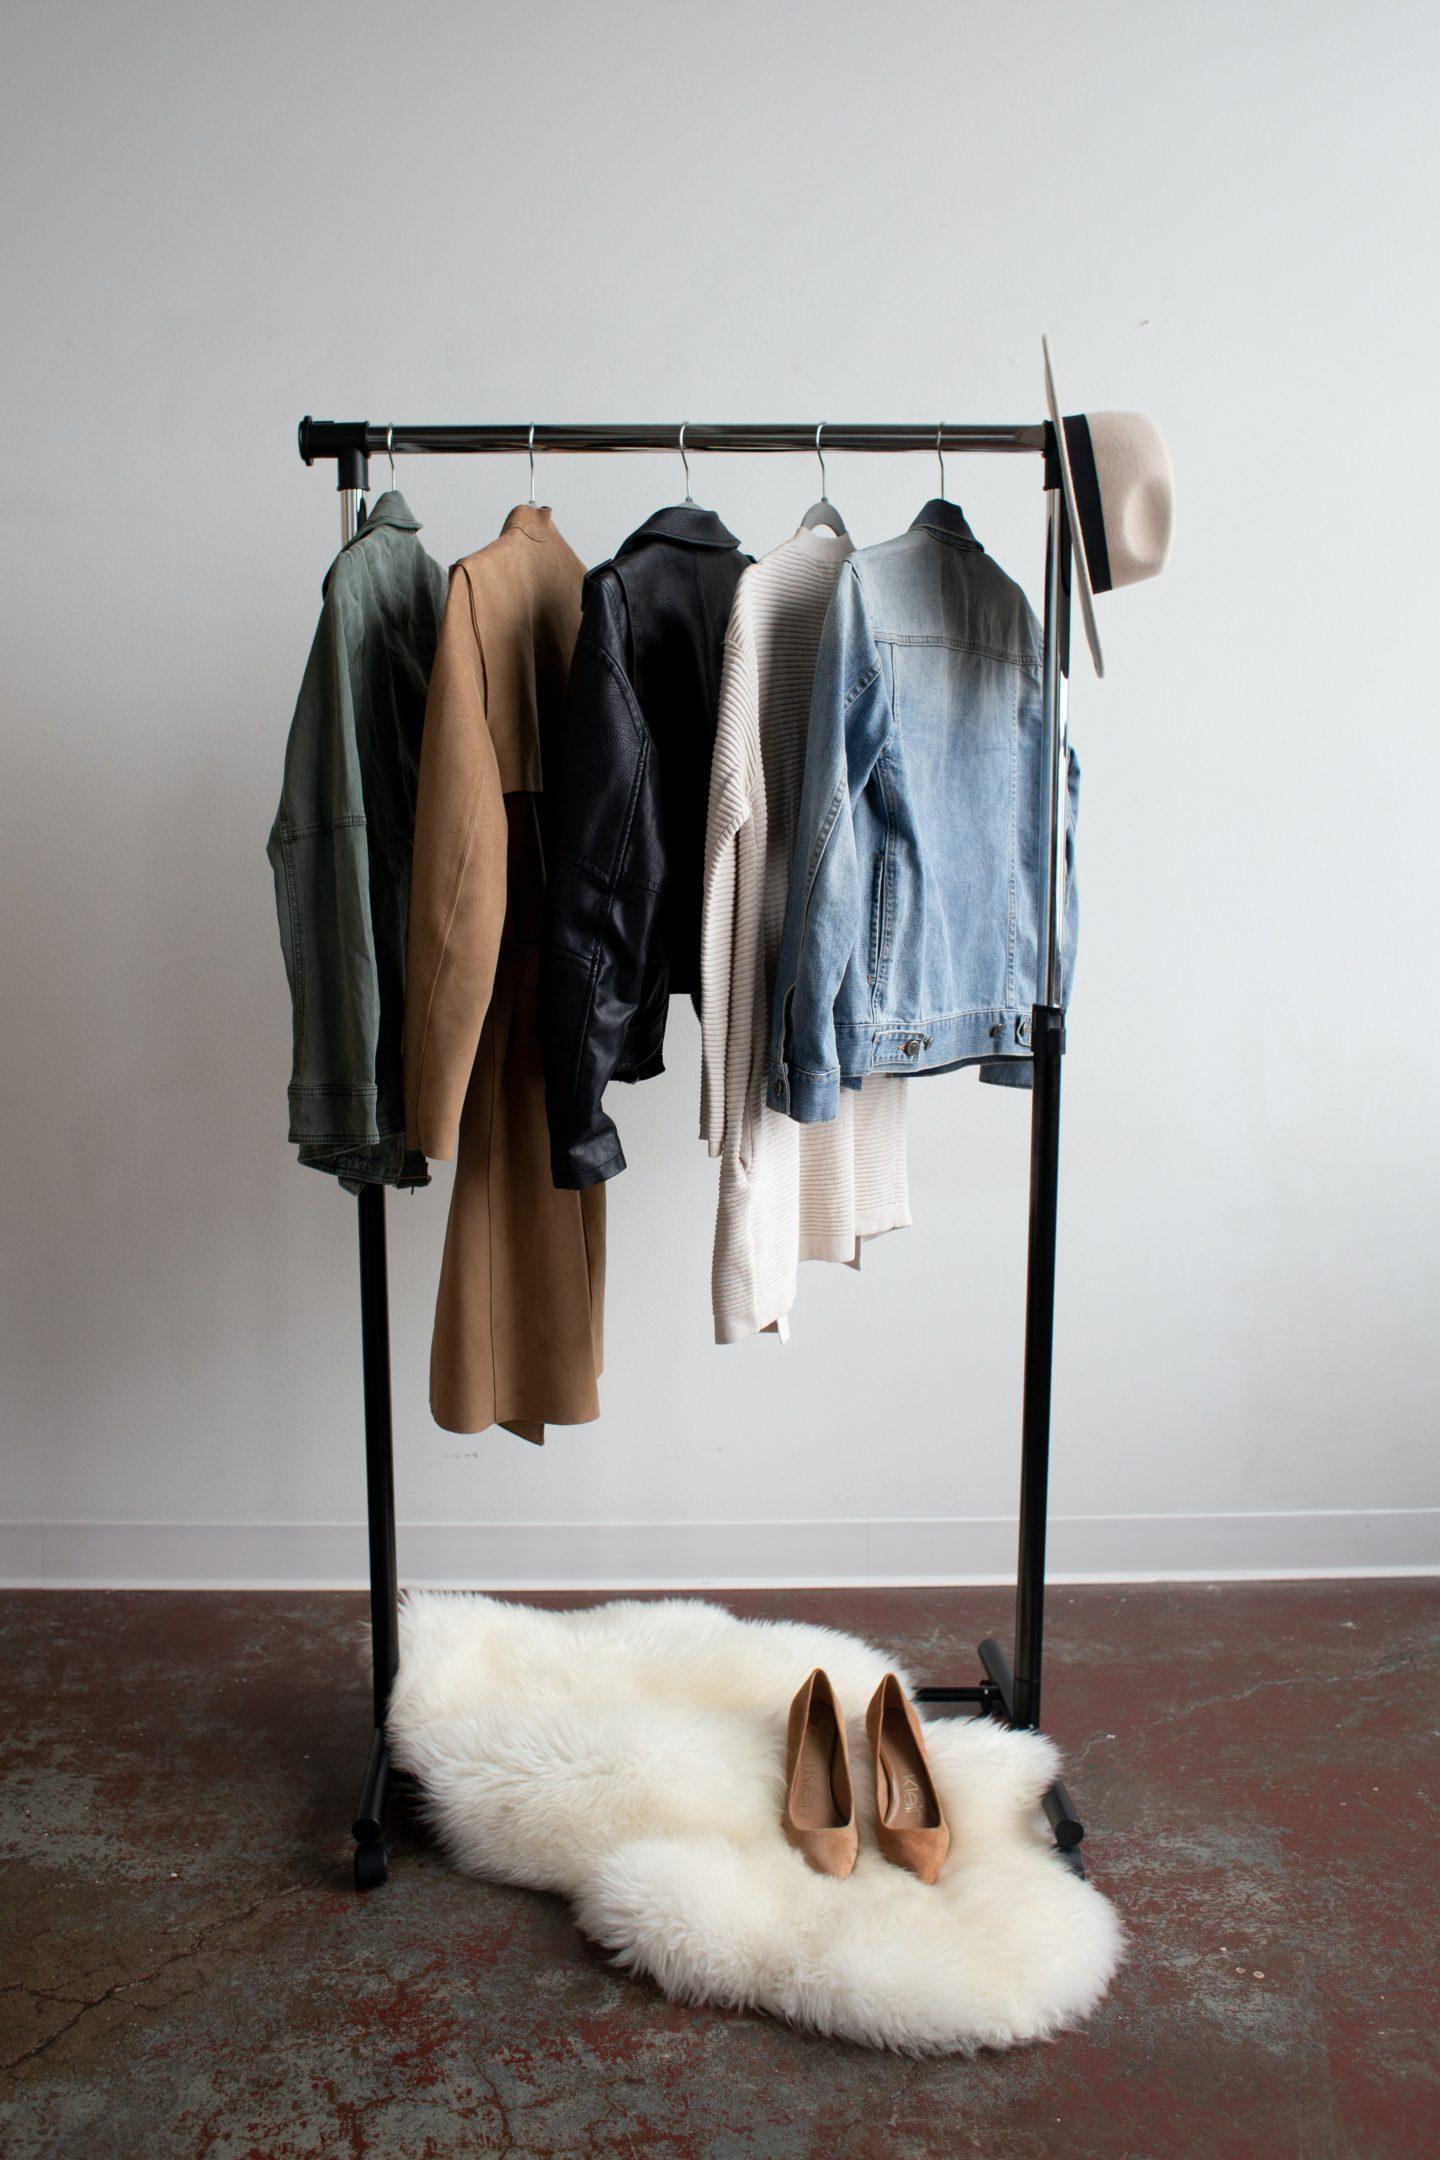 The true value of Fashion